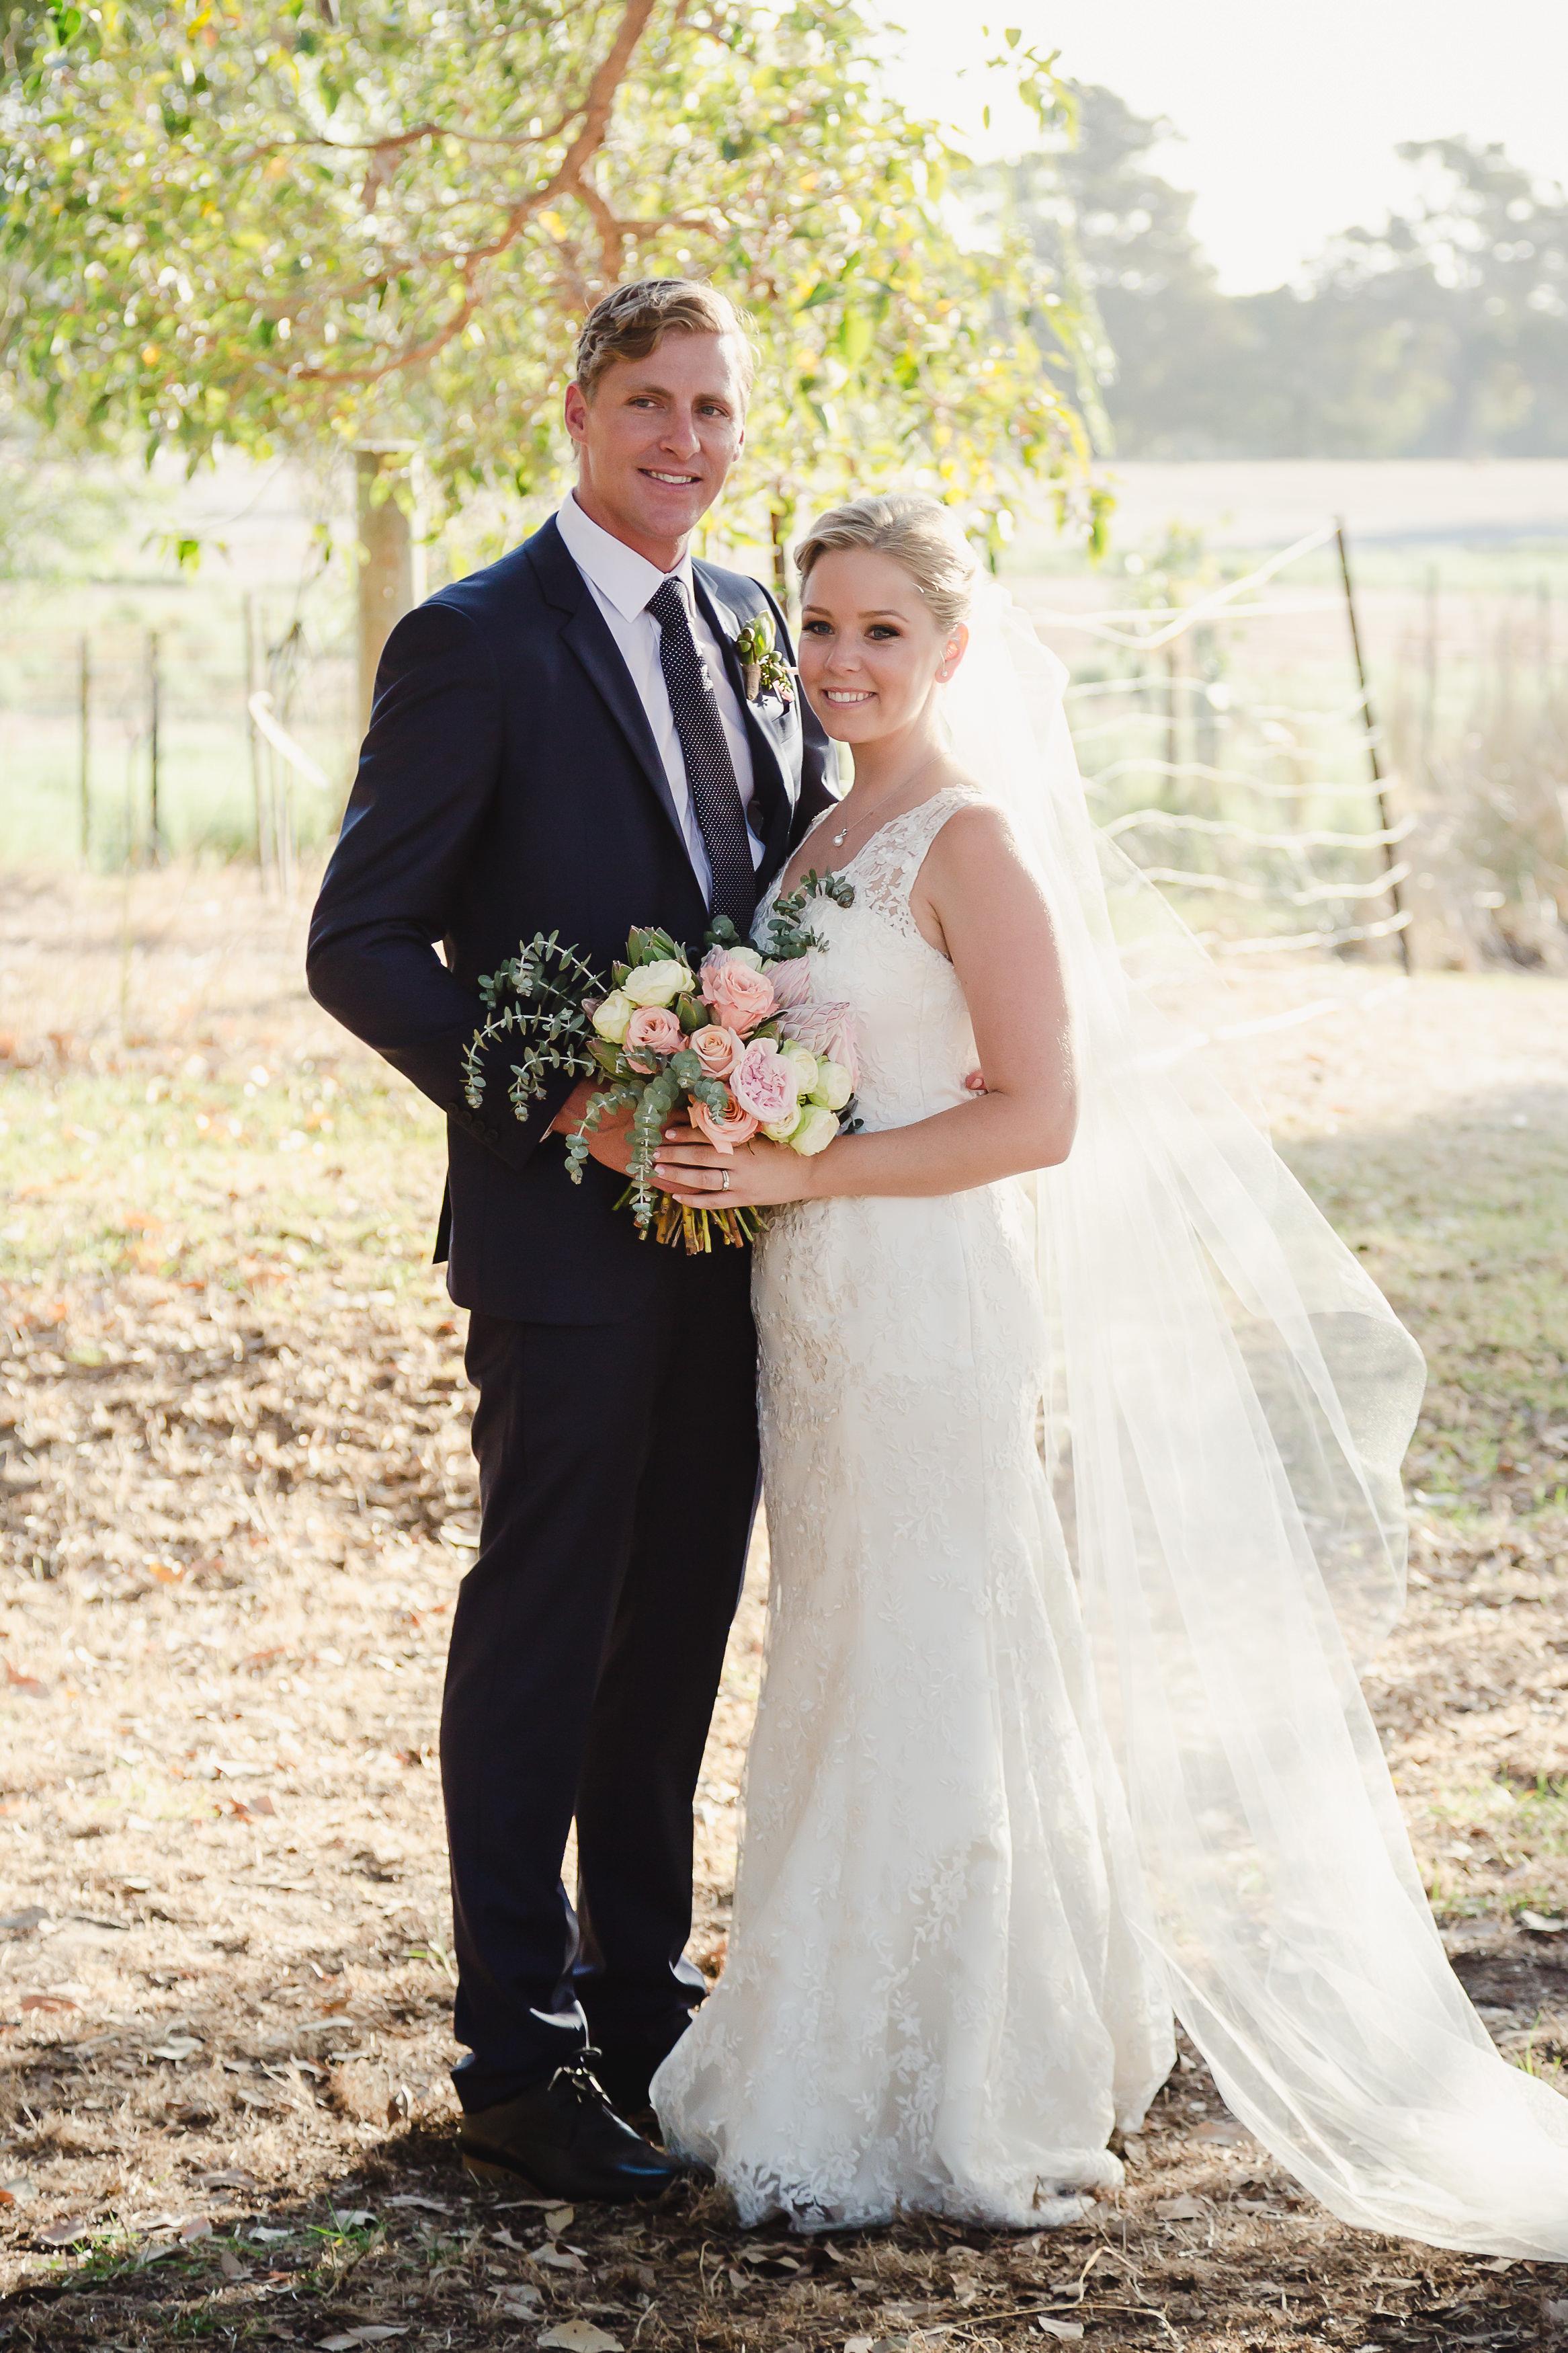 Jemma wedding dress.jpg